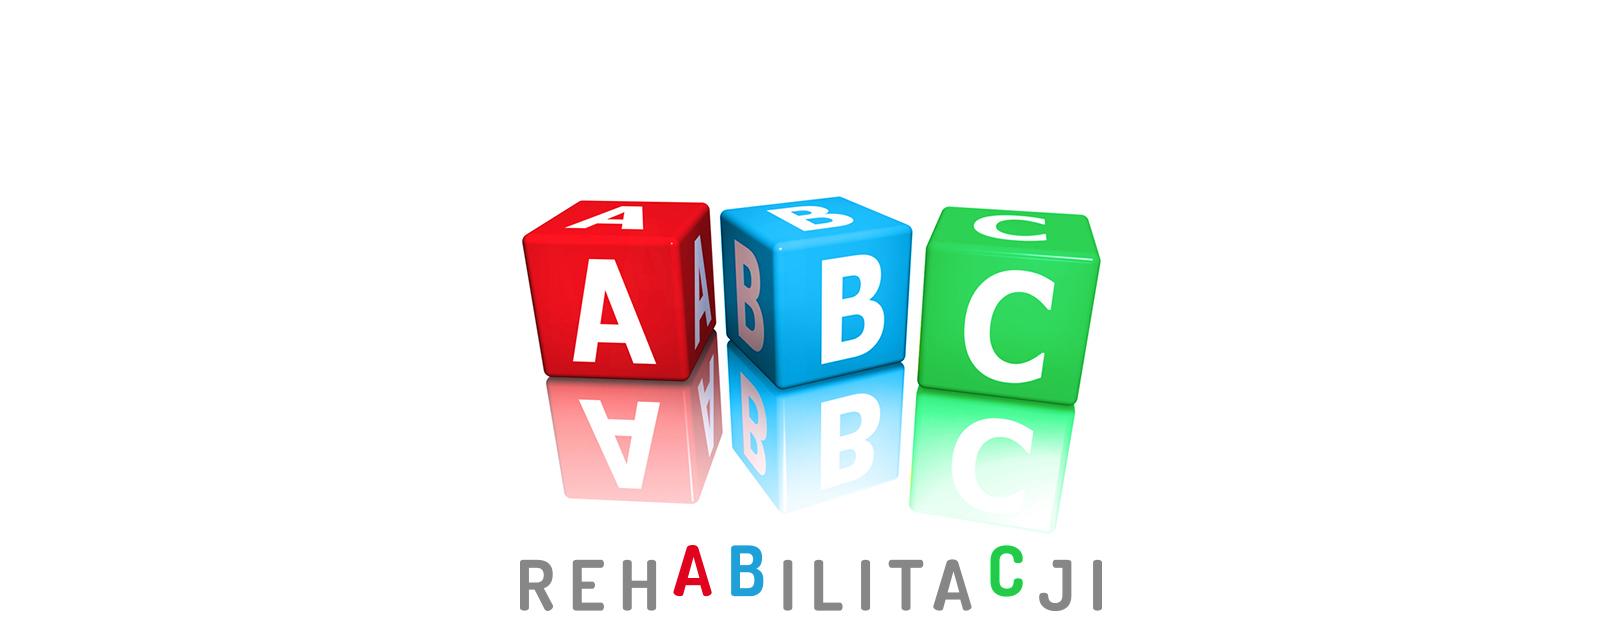 abc_rehabilitacji_baner_main_kostki_napis